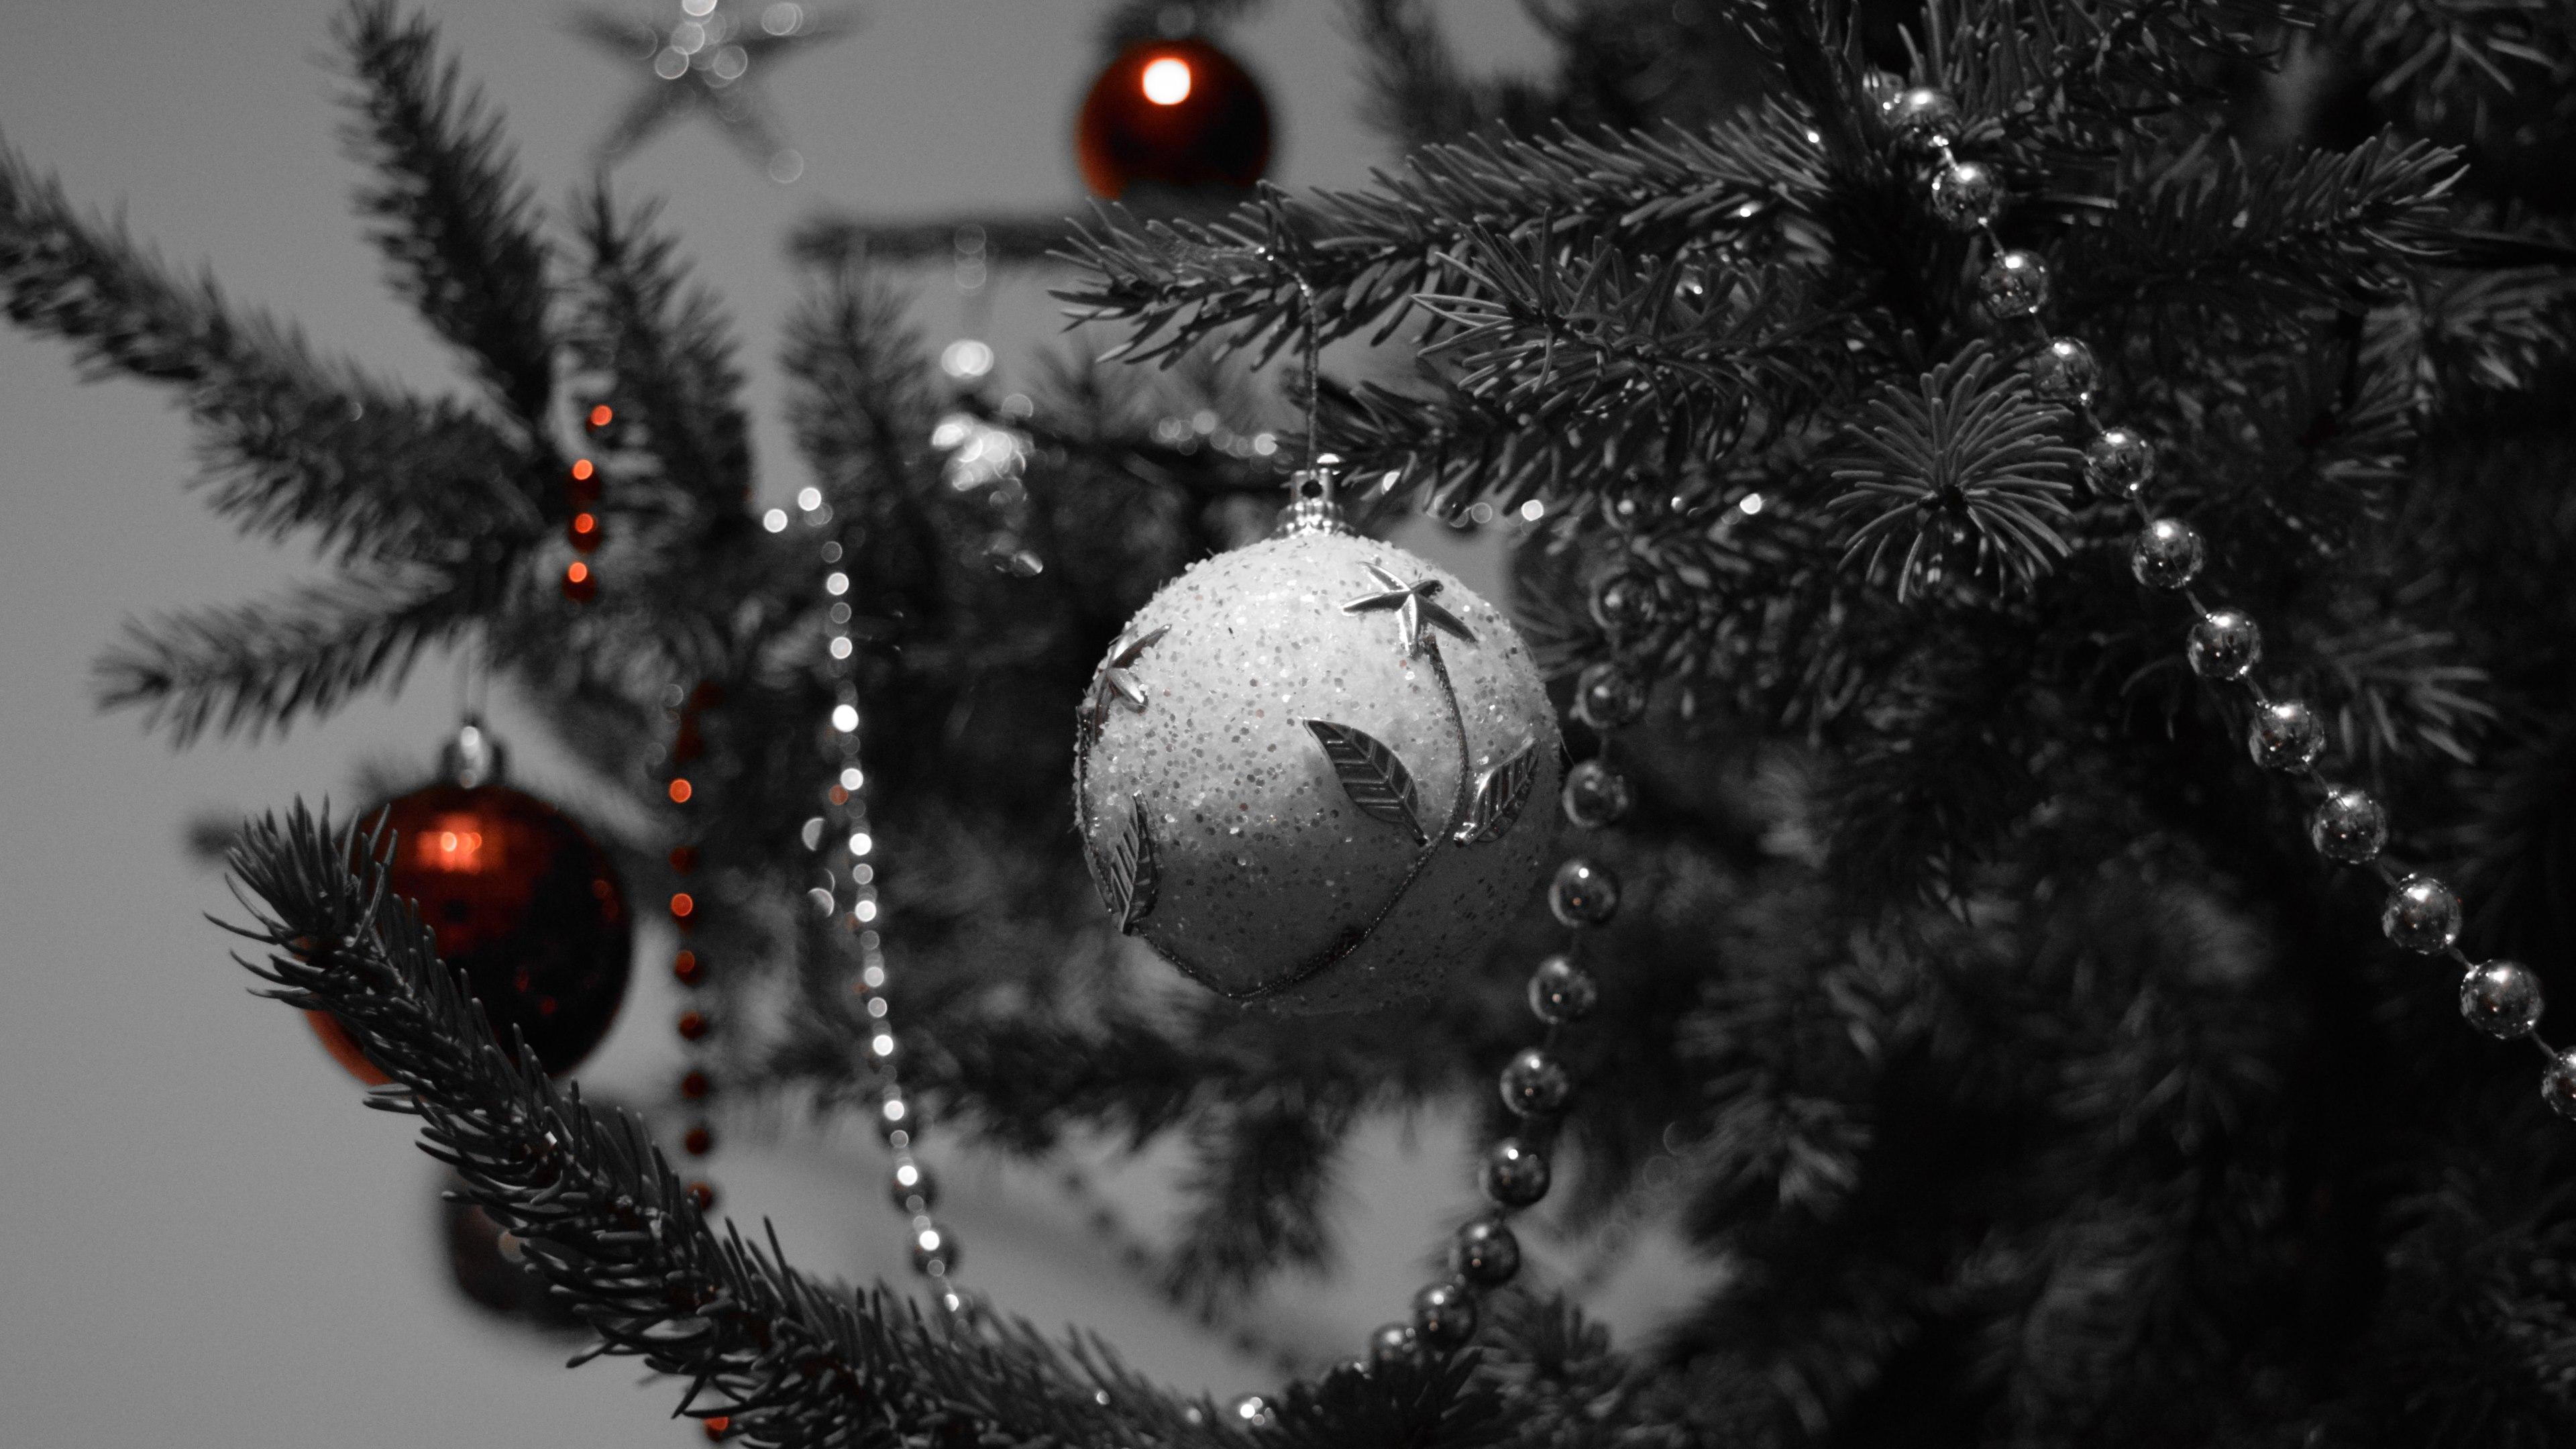 Christmas Tree 4k Wallpapers - Wallpaper Cave